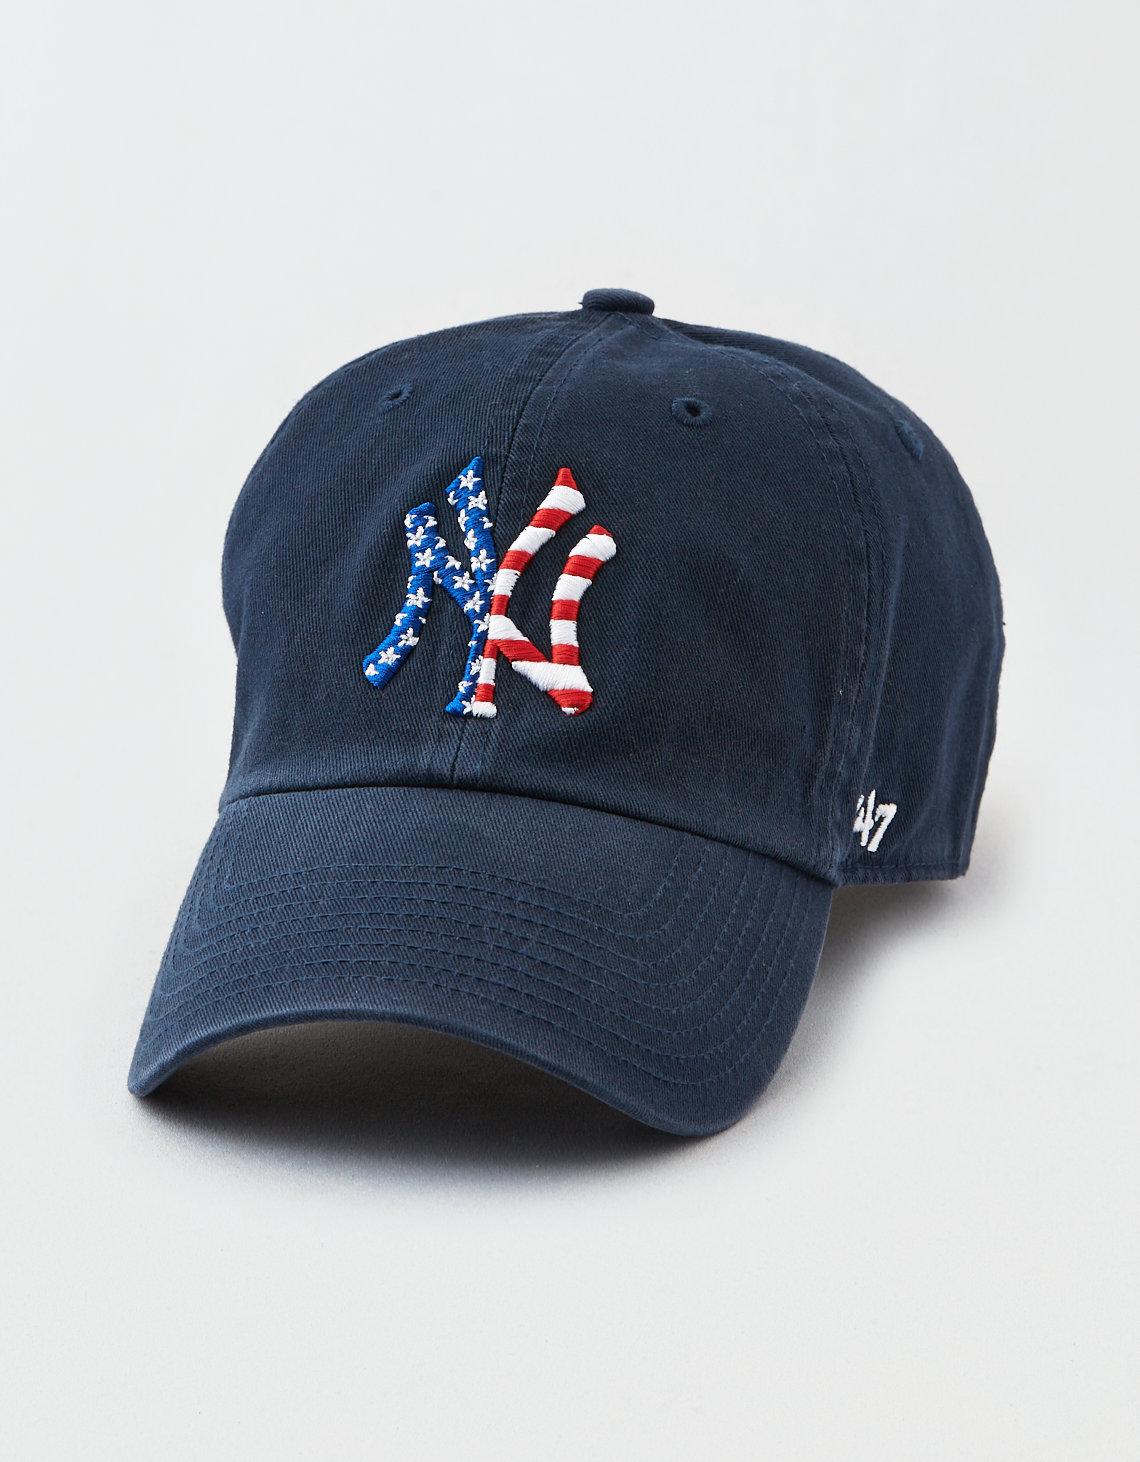 b9ac563a3 '47 Brand Star Spangled Banner New York Yankees Baseball Cap